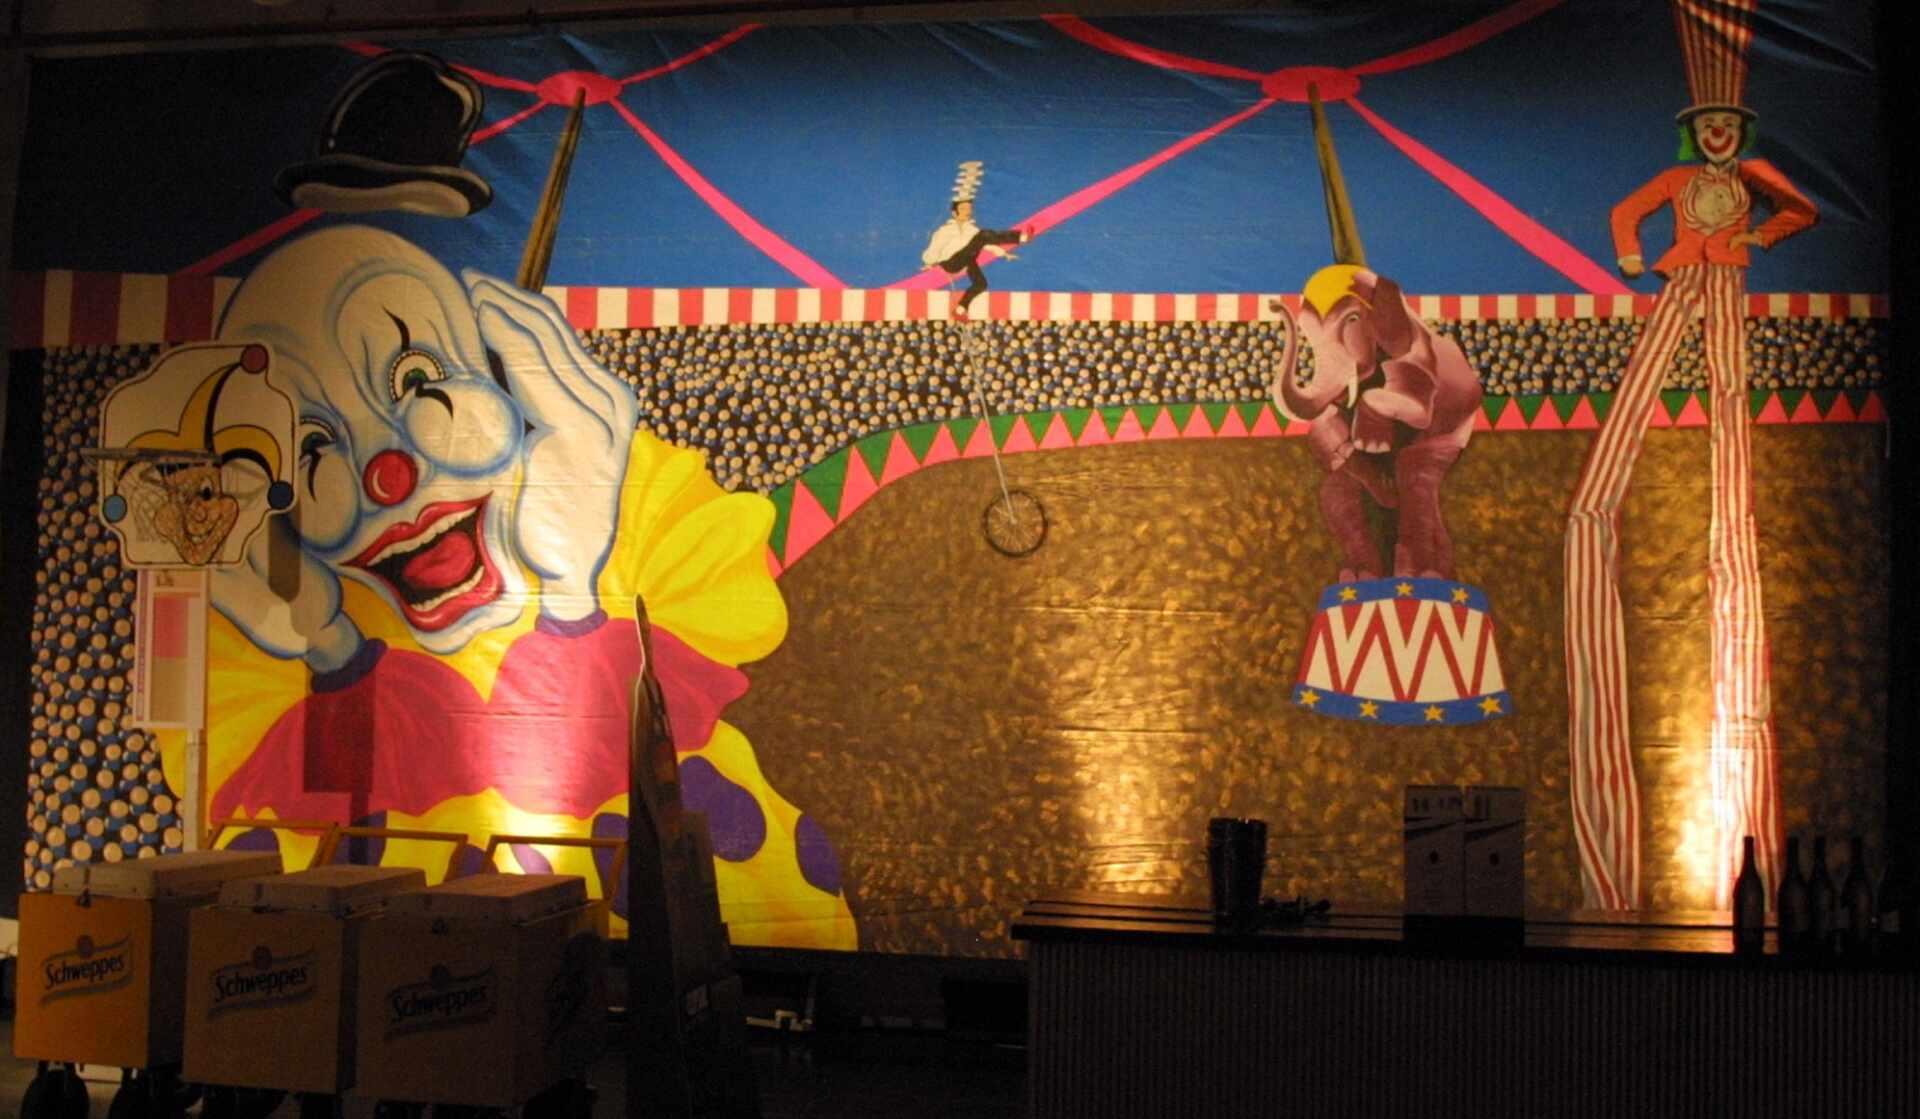 Drapes & Backdrops, Drapes & Backdrop Hire Melbourne